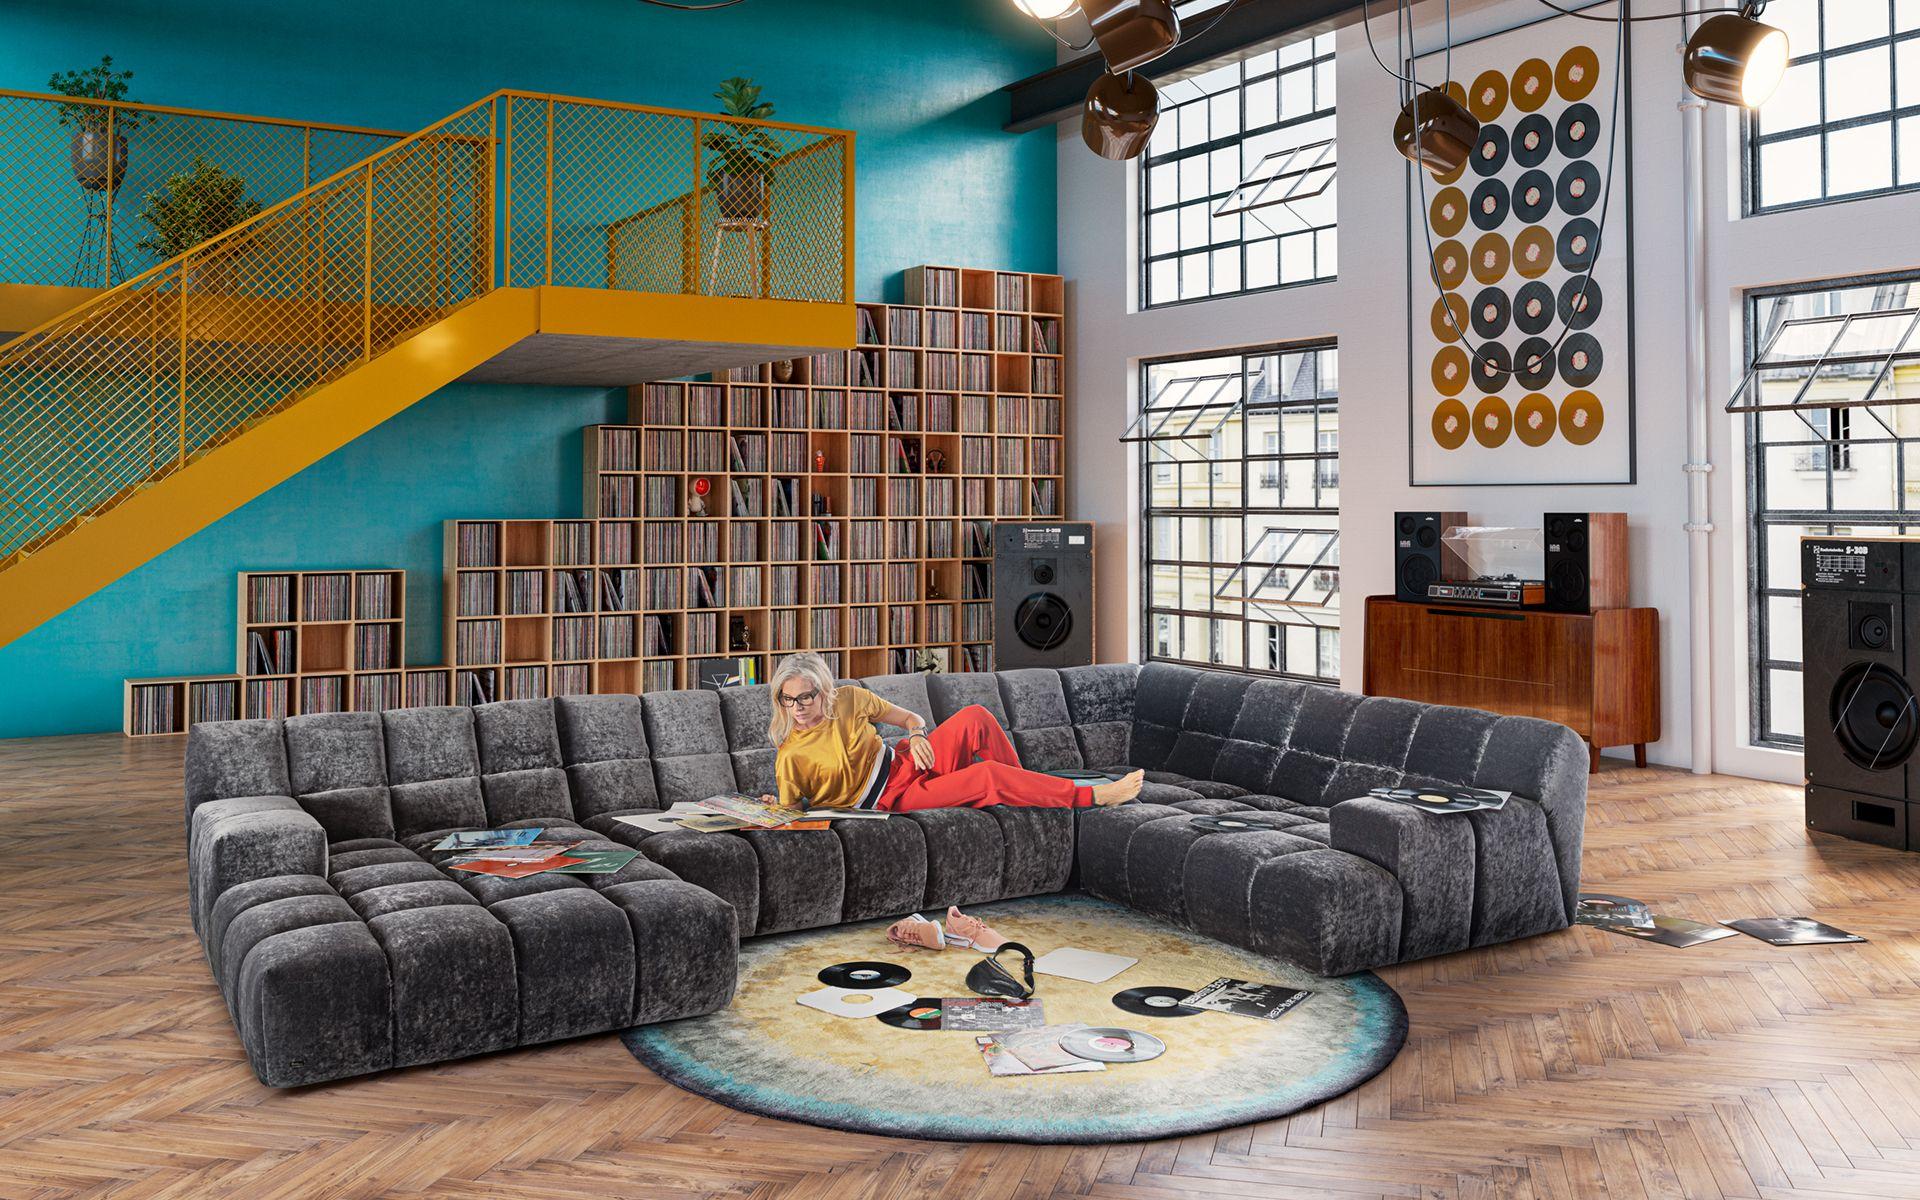 Bretz - Design Sofa Hersteller made in Germany since 7 ✓